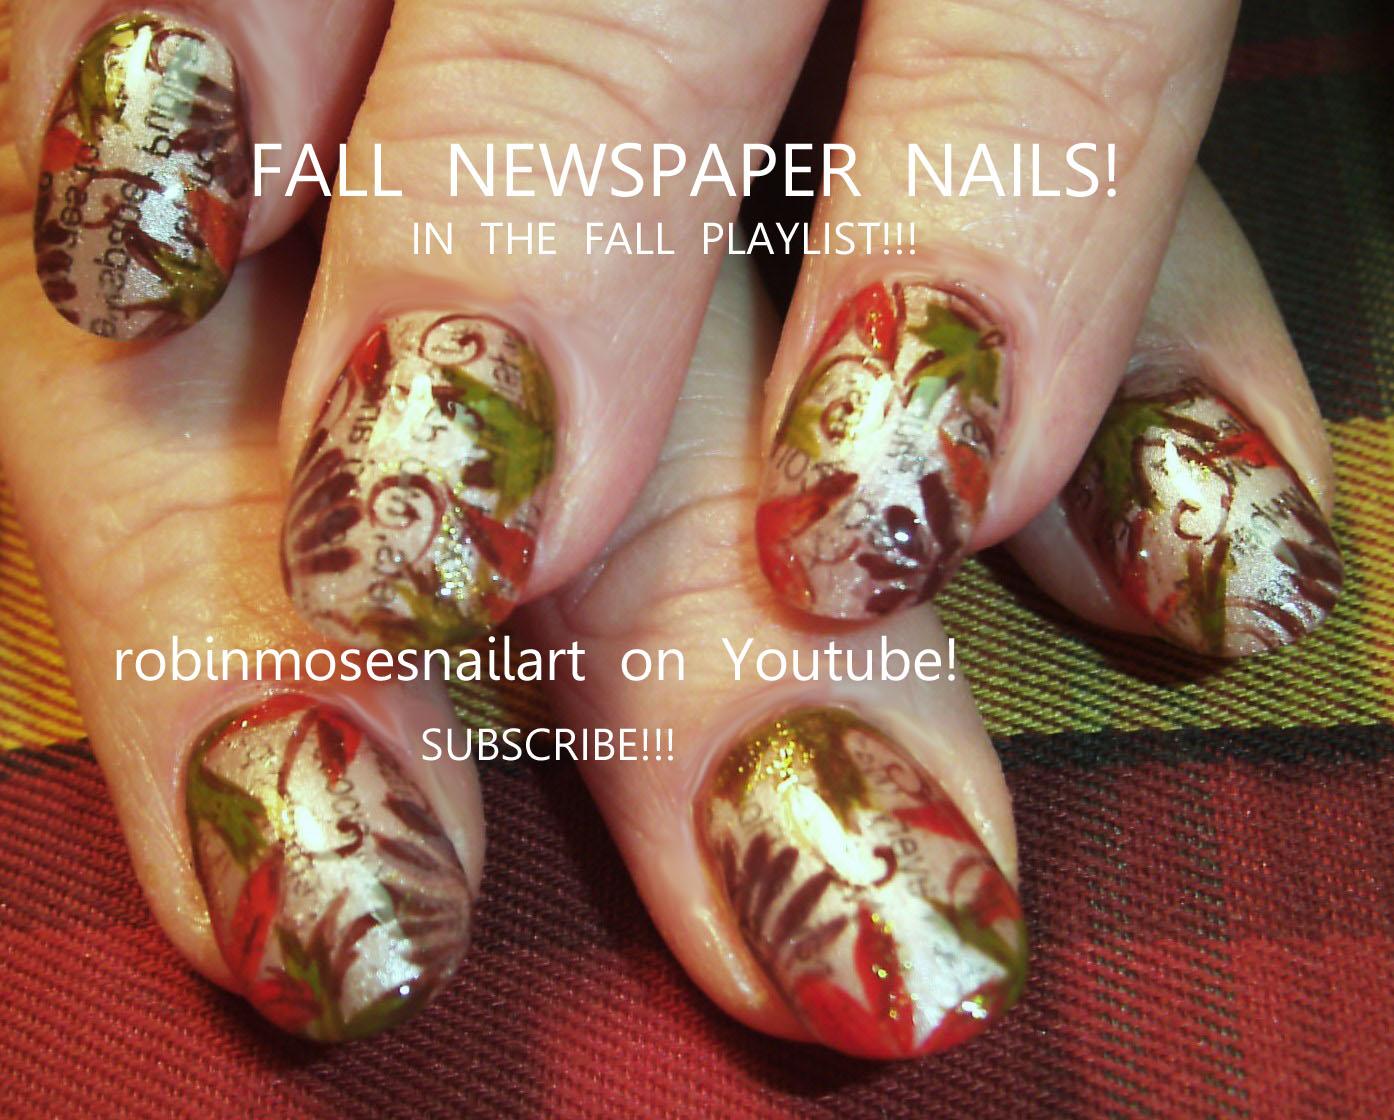 beetlejuice nail art, beetlegeuse nail art, betelgeuse nail art ...